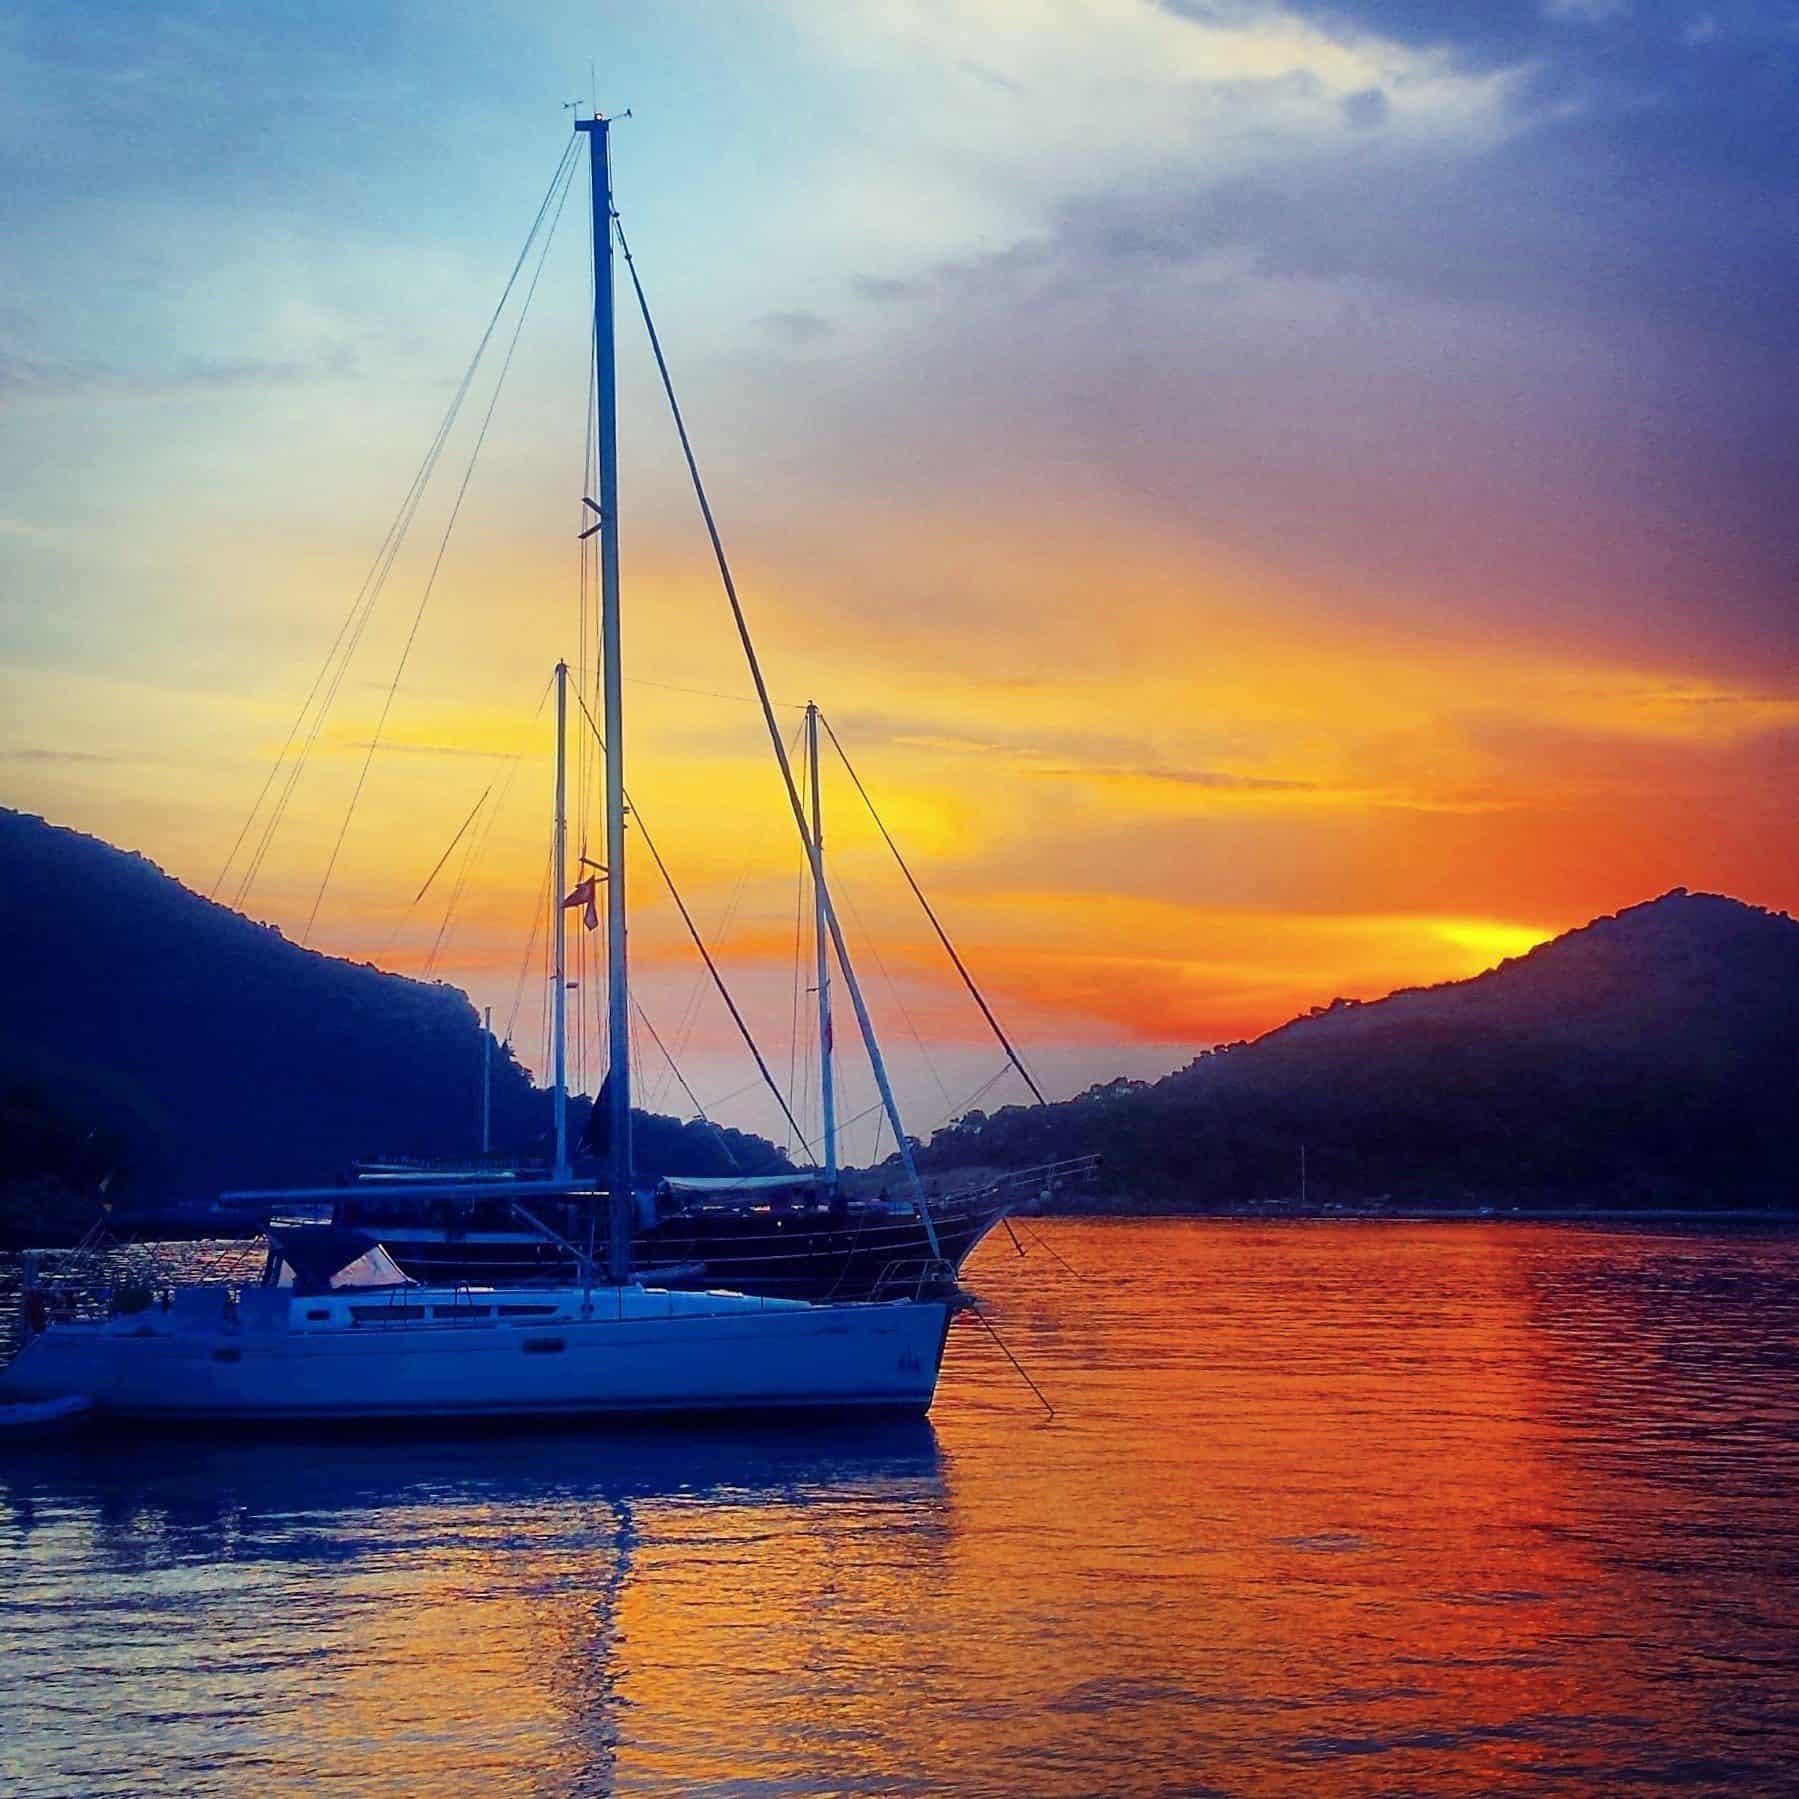 sunset on gemiler island